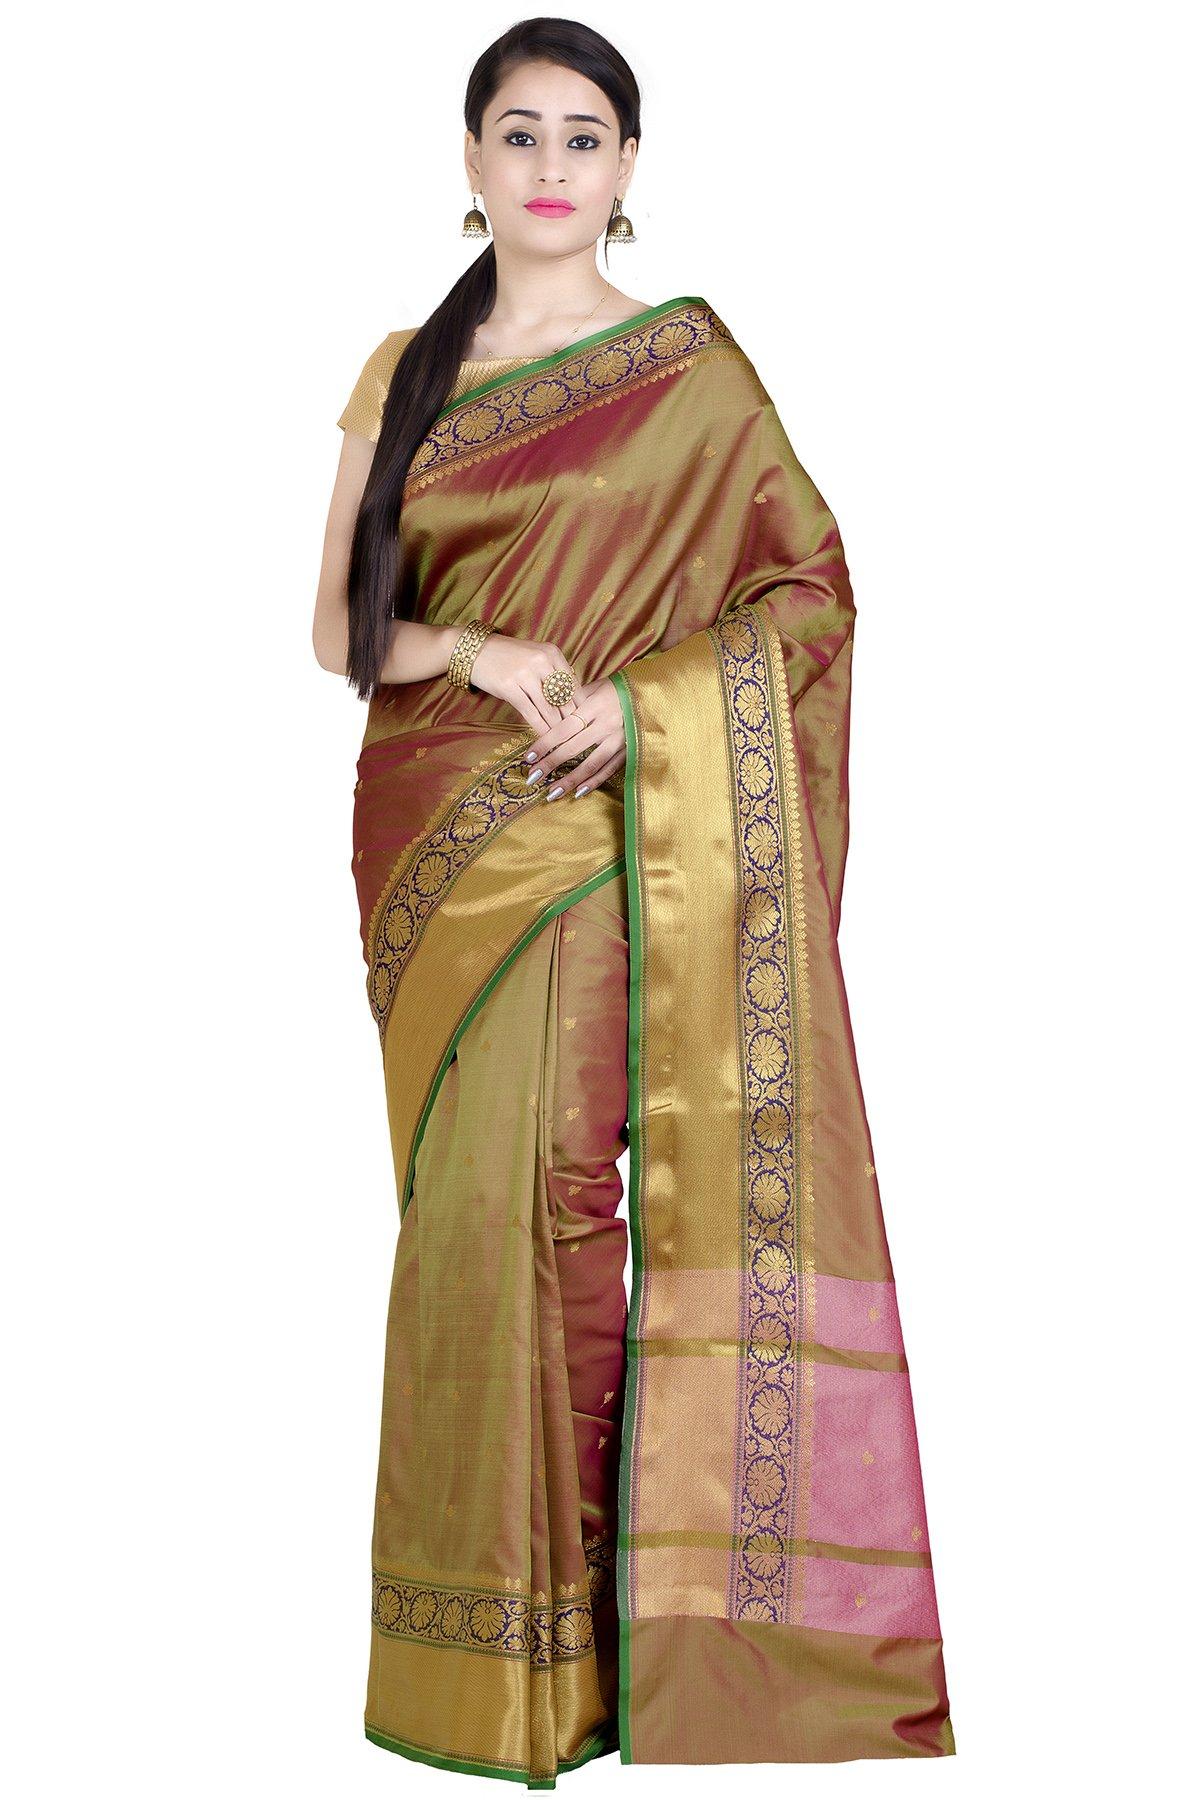 Chandrakala Women's Mehndi Green Art Silk Banarasi Saree(1286MEH)